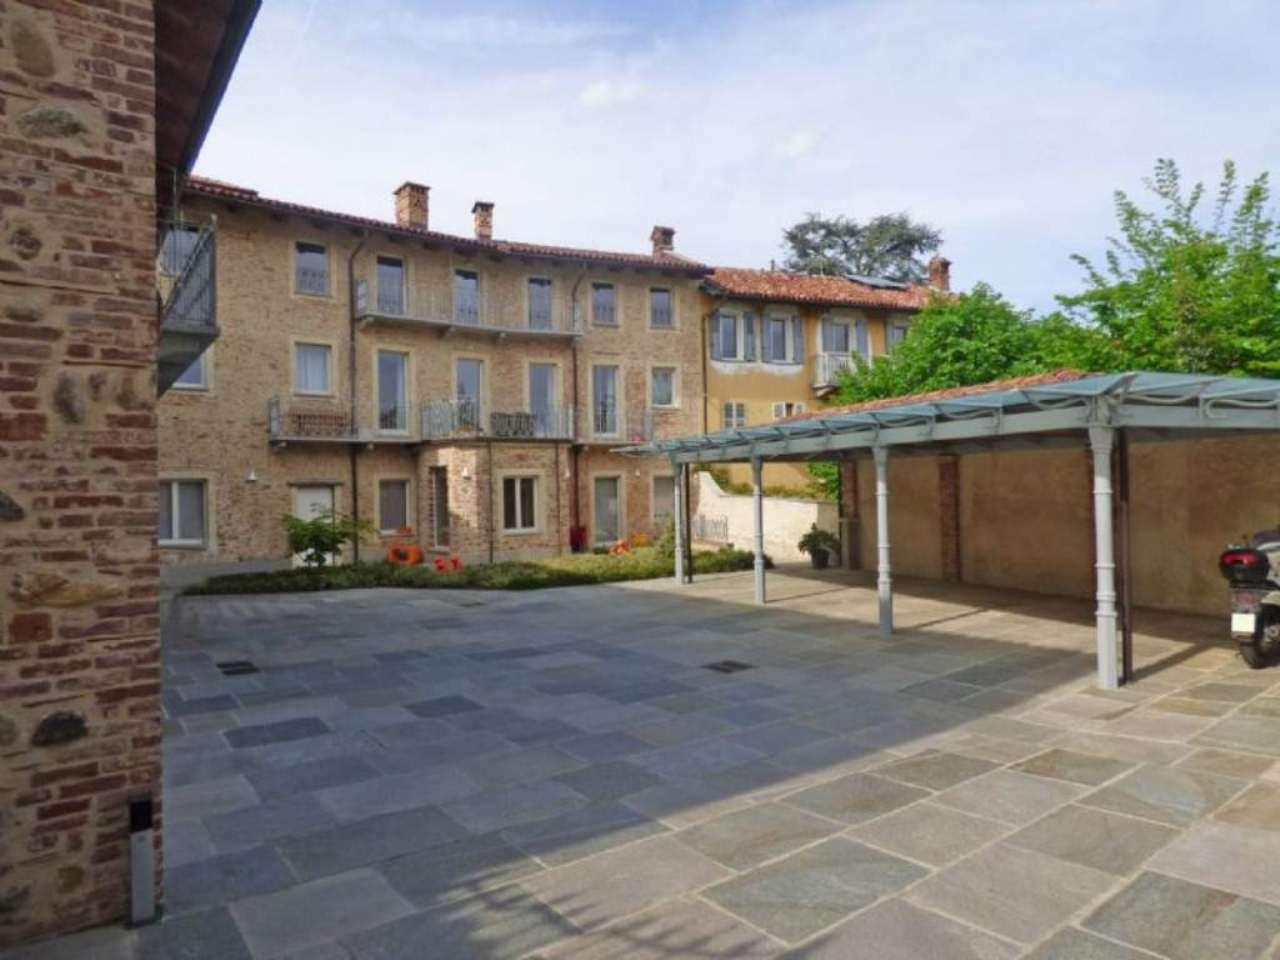 Bilocale Pecetto Torinese Via Umberto I 2